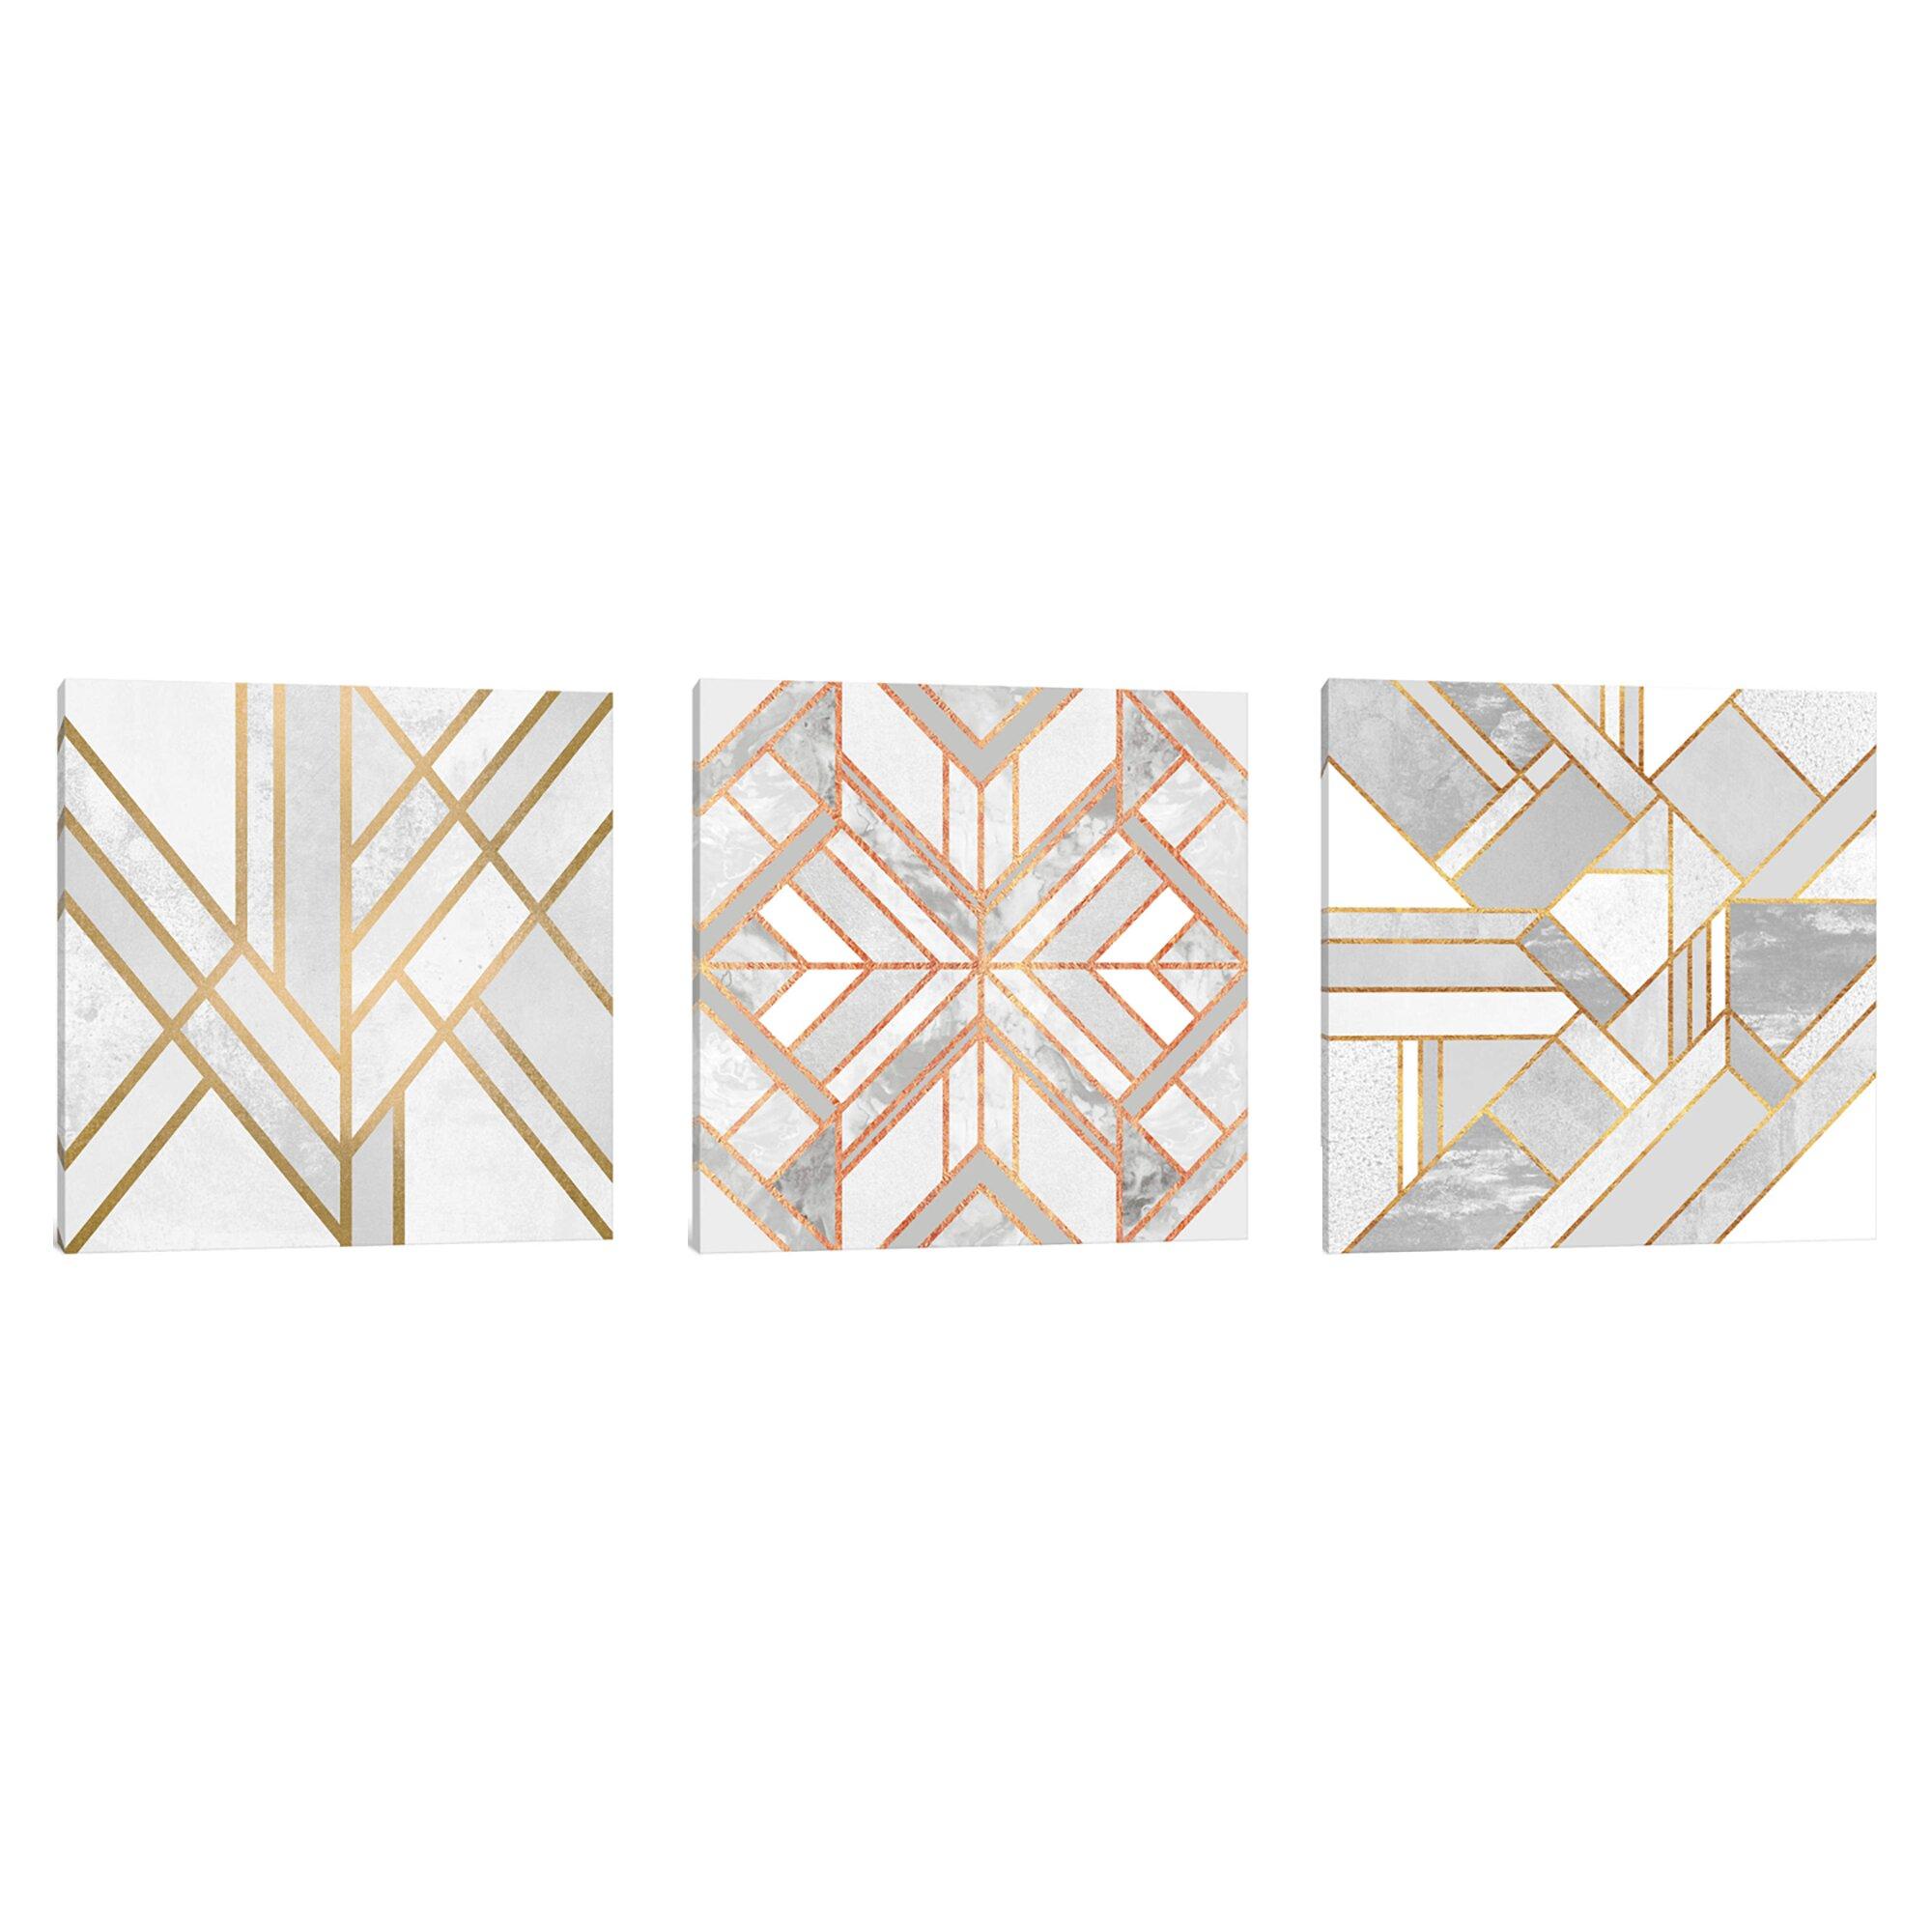 Hykkon Gold Marble Art Triptych 3 Piece Graphic Art Set On Wrapped Canvas Wayfair Co Uk